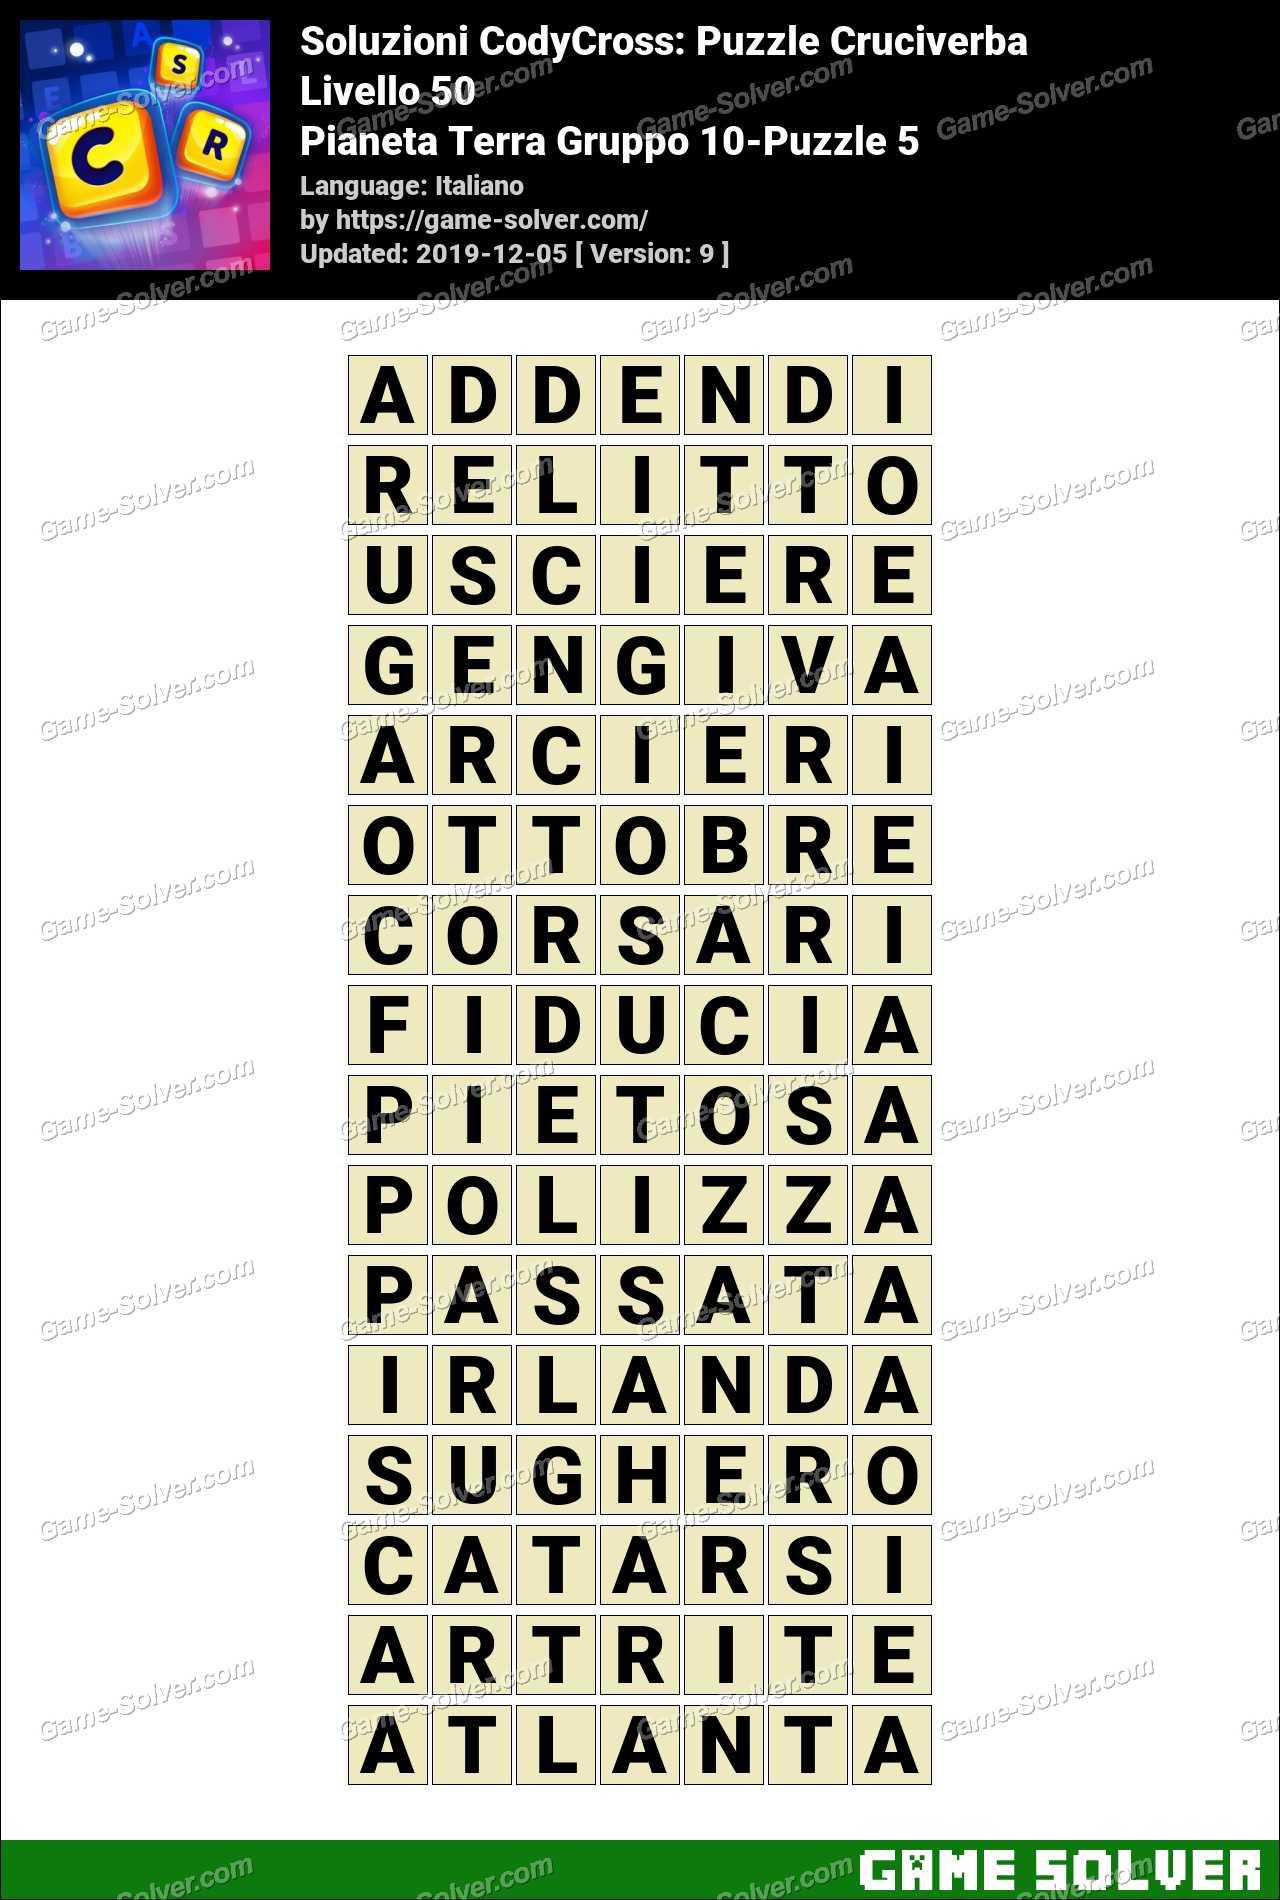 Soluzioni CodyCross Pianeta Terra Gruppo 10-Puzzle 5